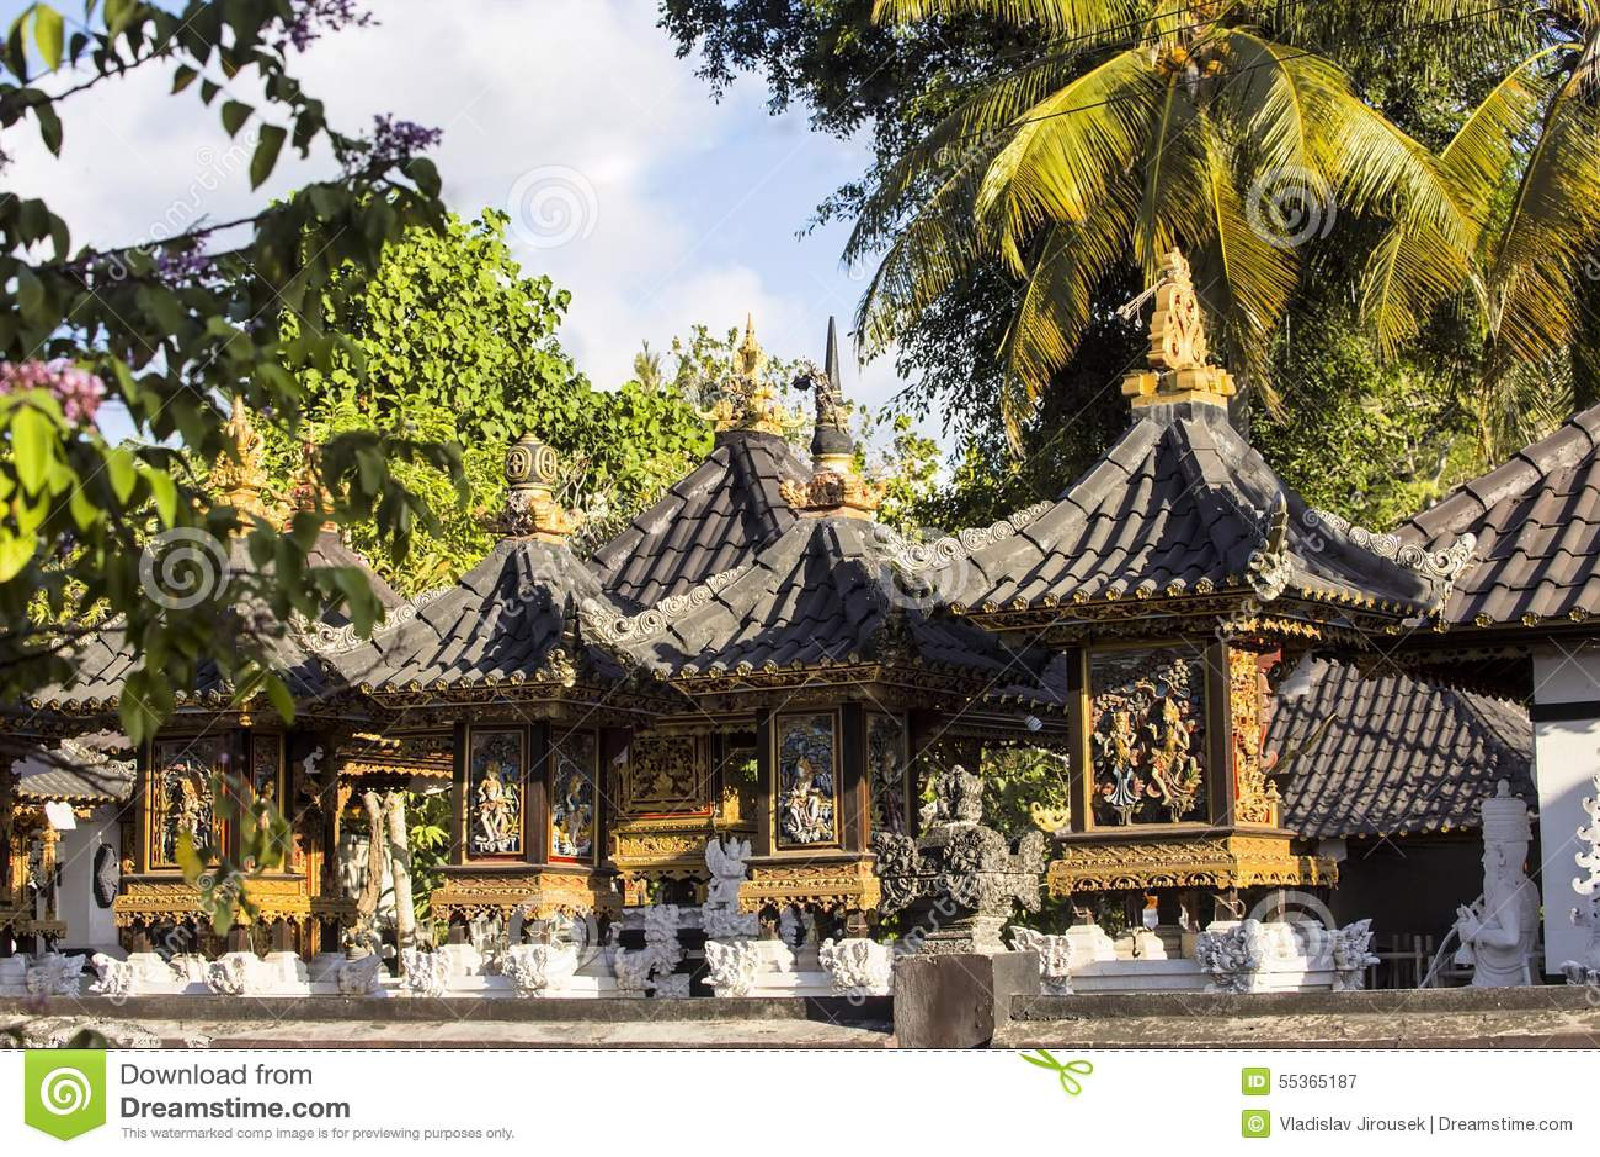 Case indù della cultura dei fantasmi, Nusa Penida, Indonesia